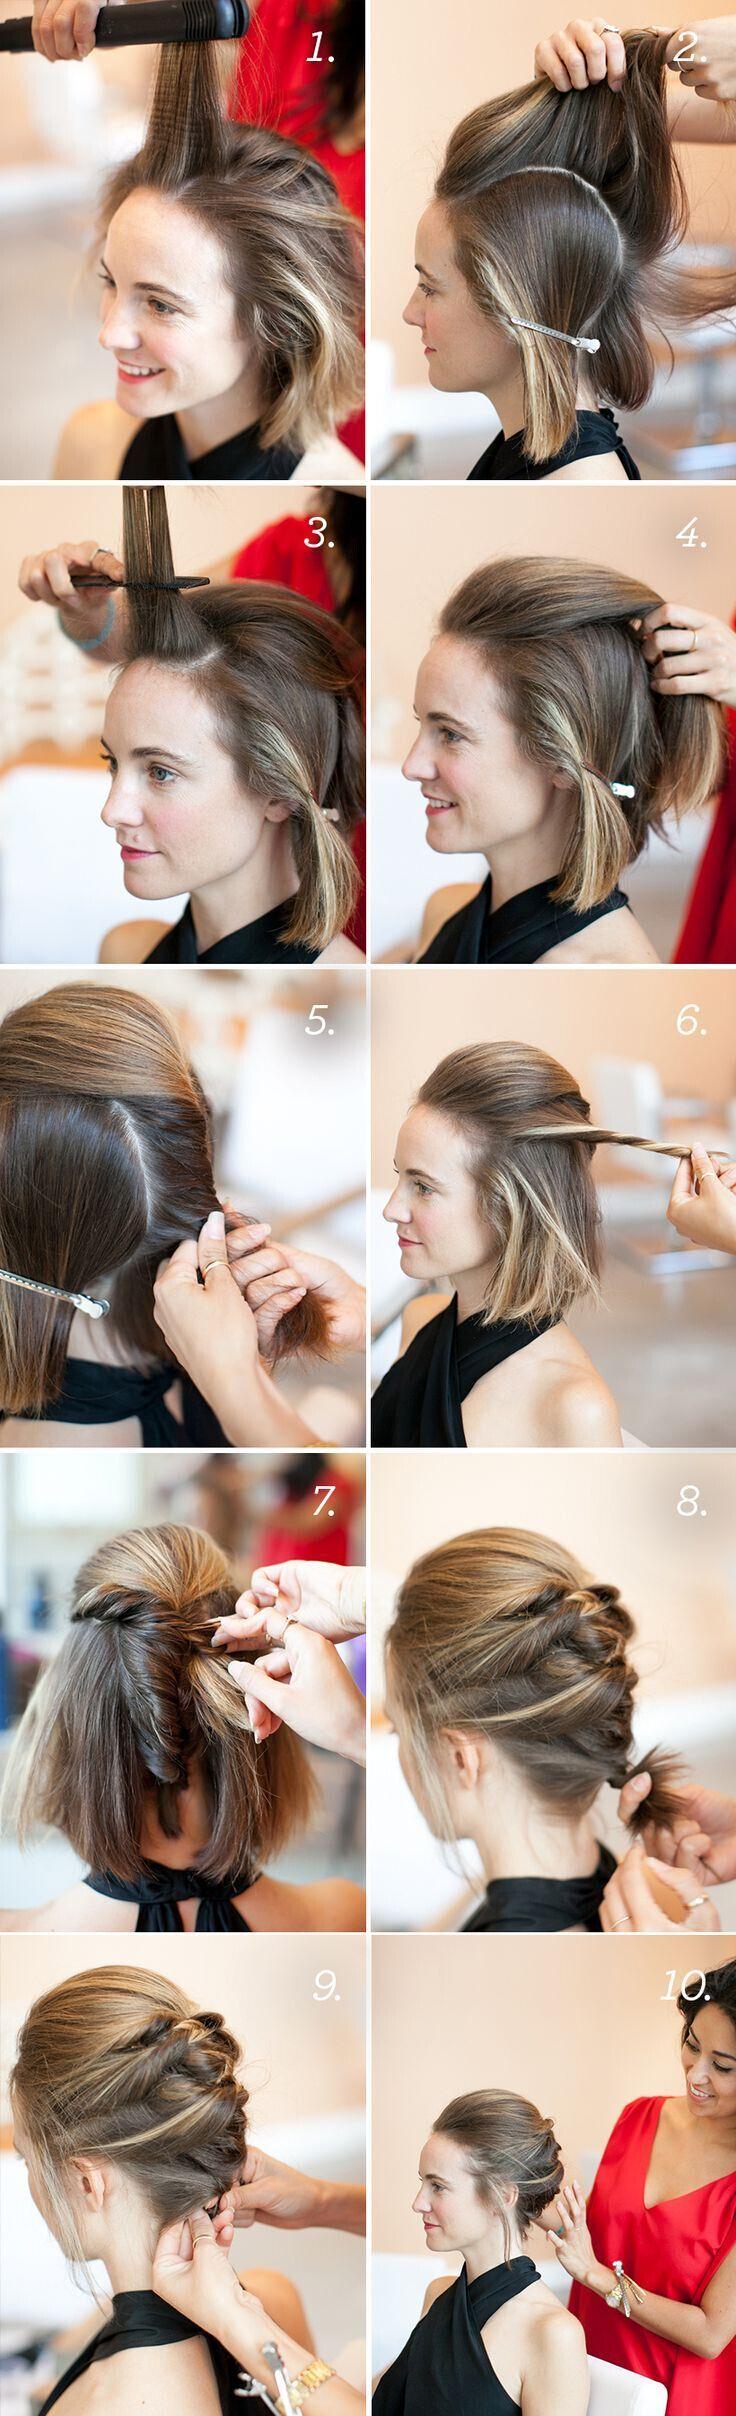 Wondrous Simple Braided Updos For Short Hair Braids Short Hairstyles Gunalazisus